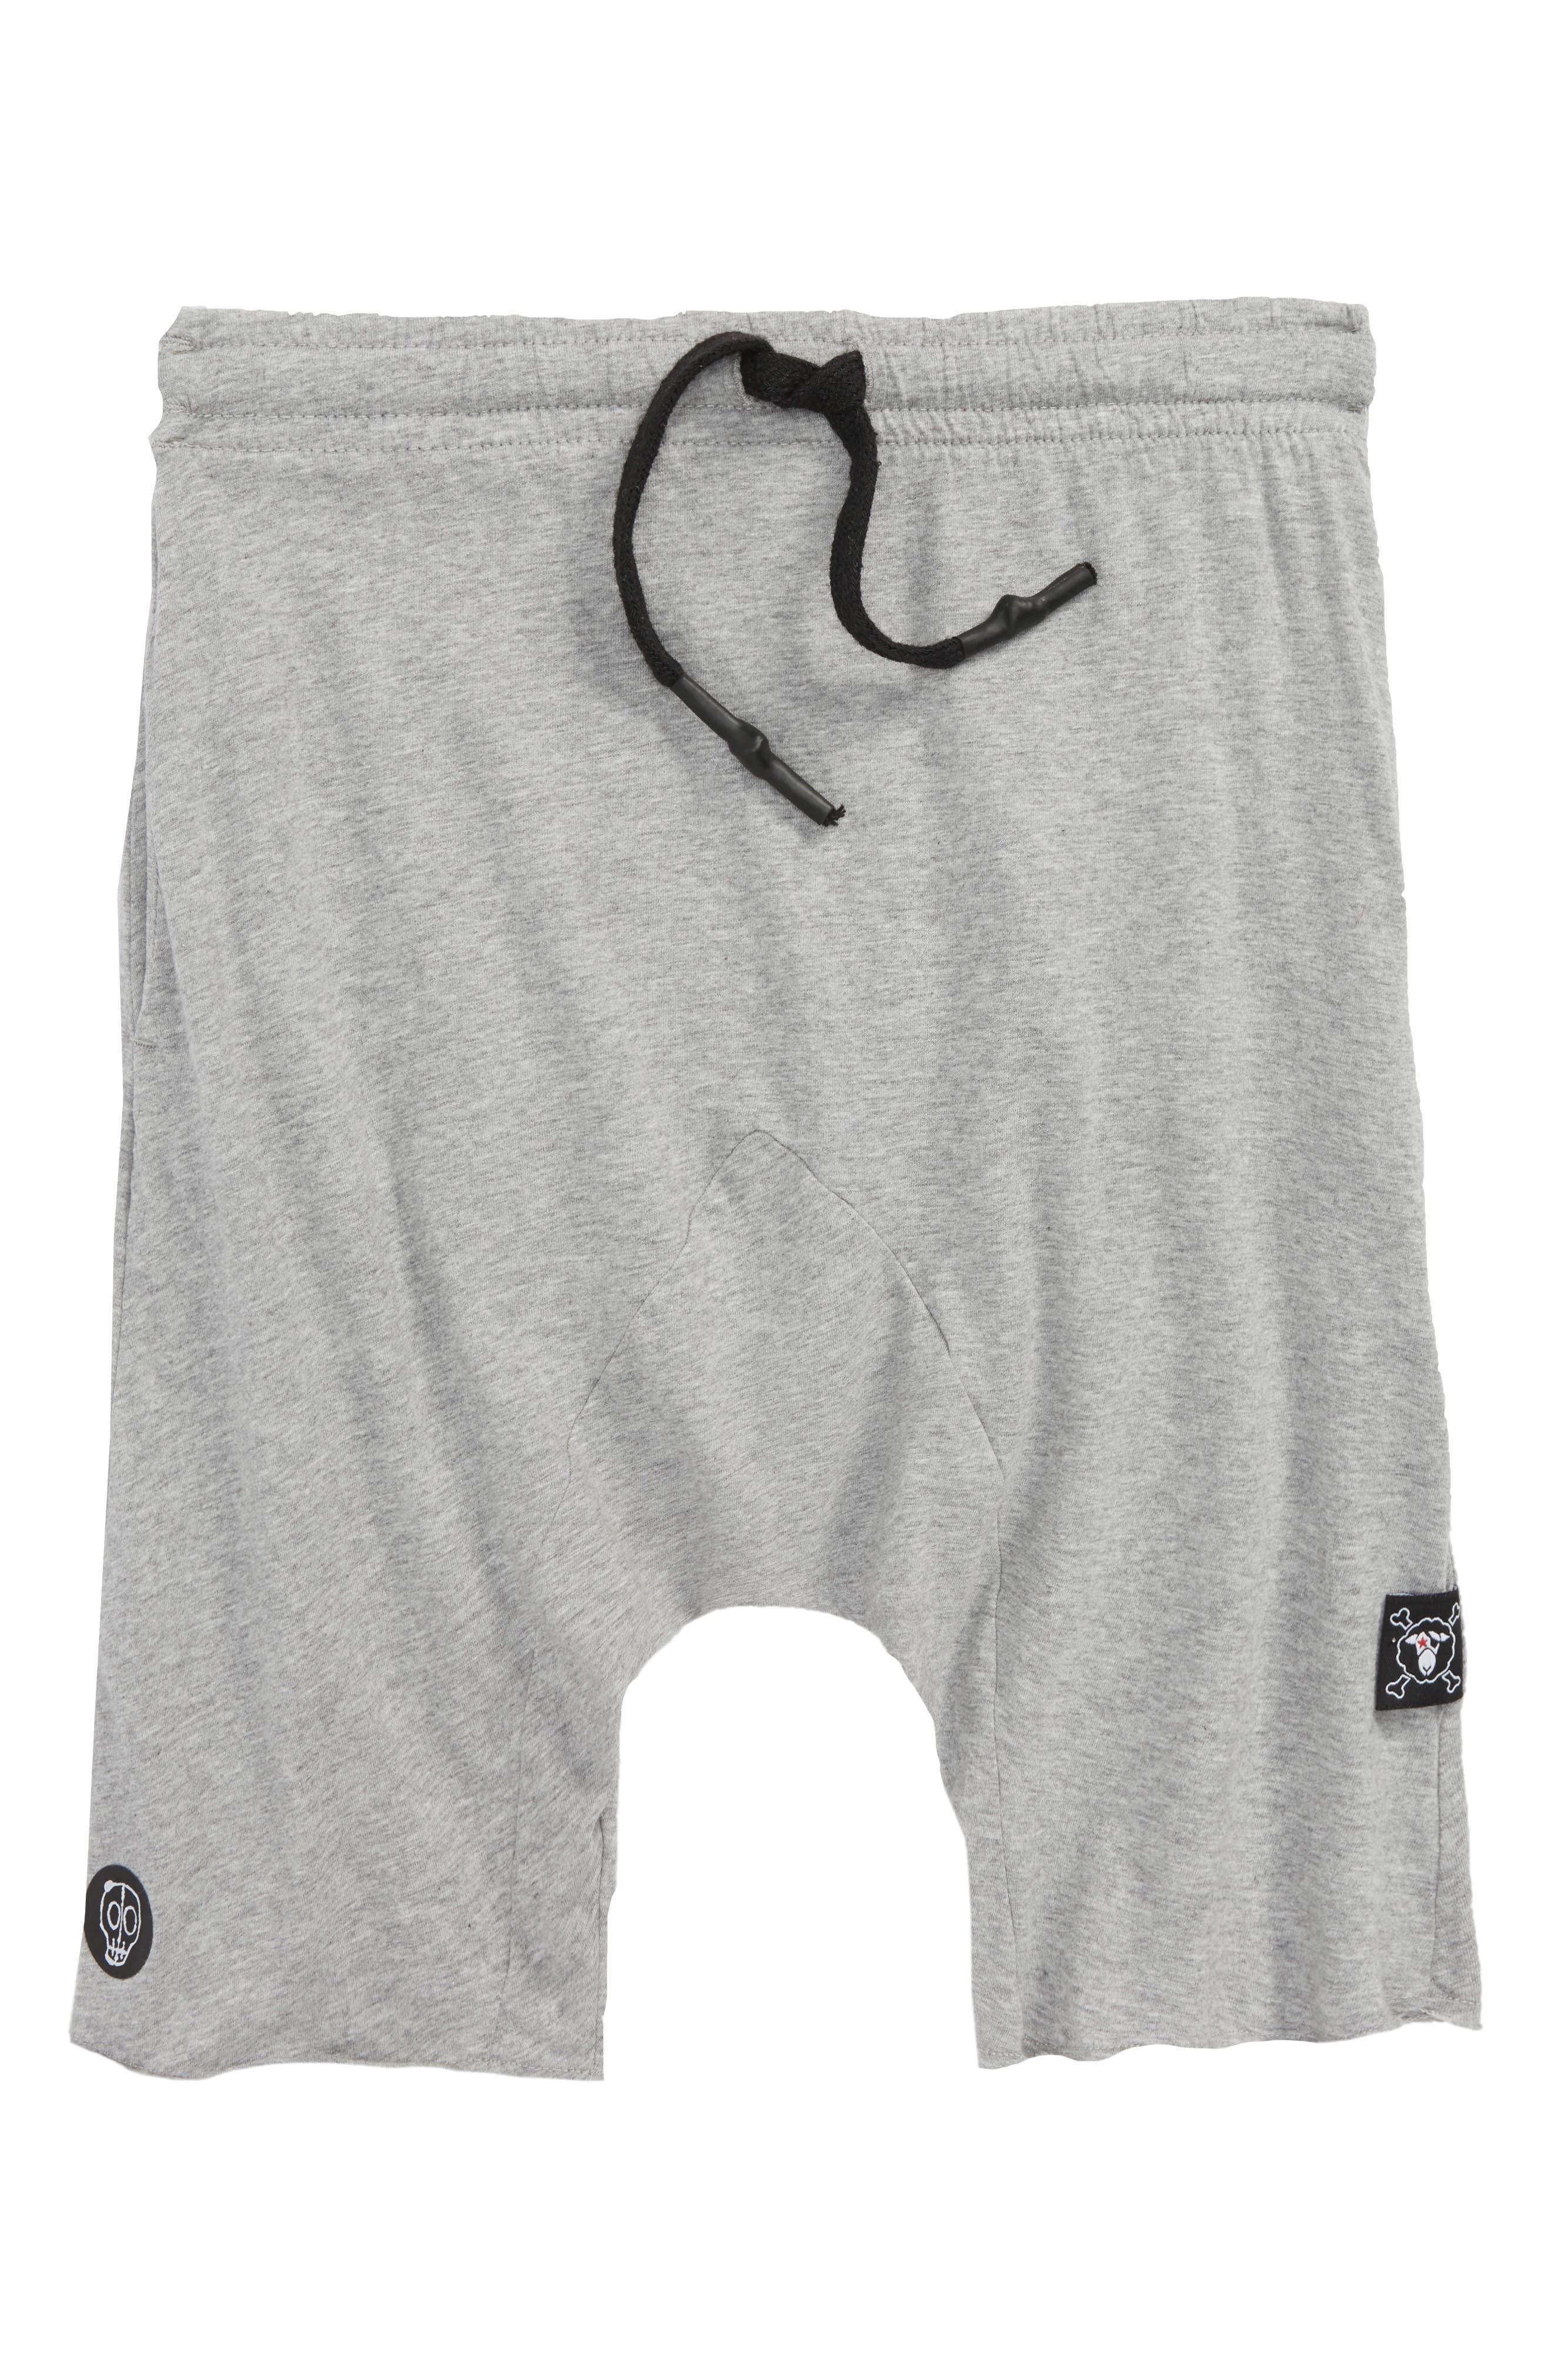 Knit Shorts,                         Main,                         color, Heather Grey